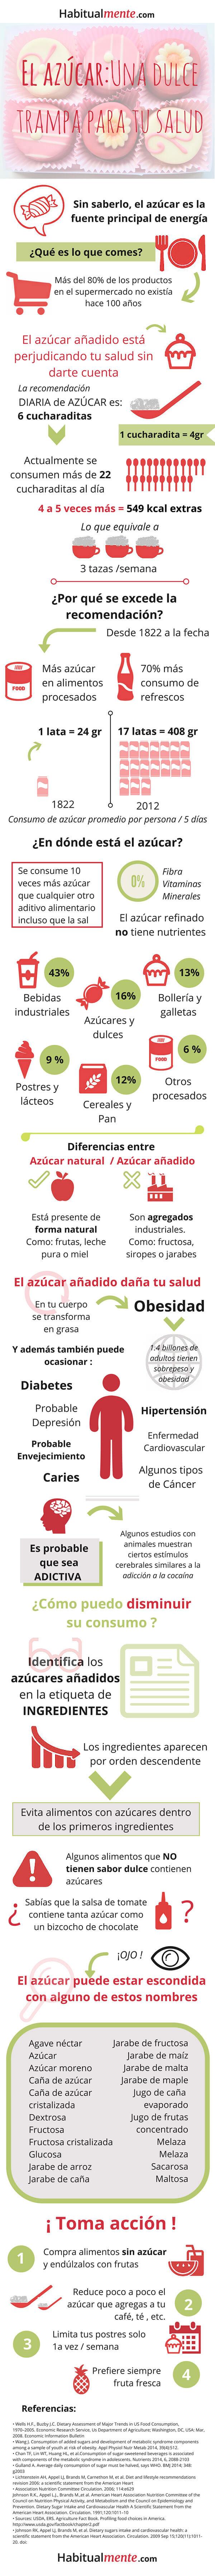 infografia-azucares